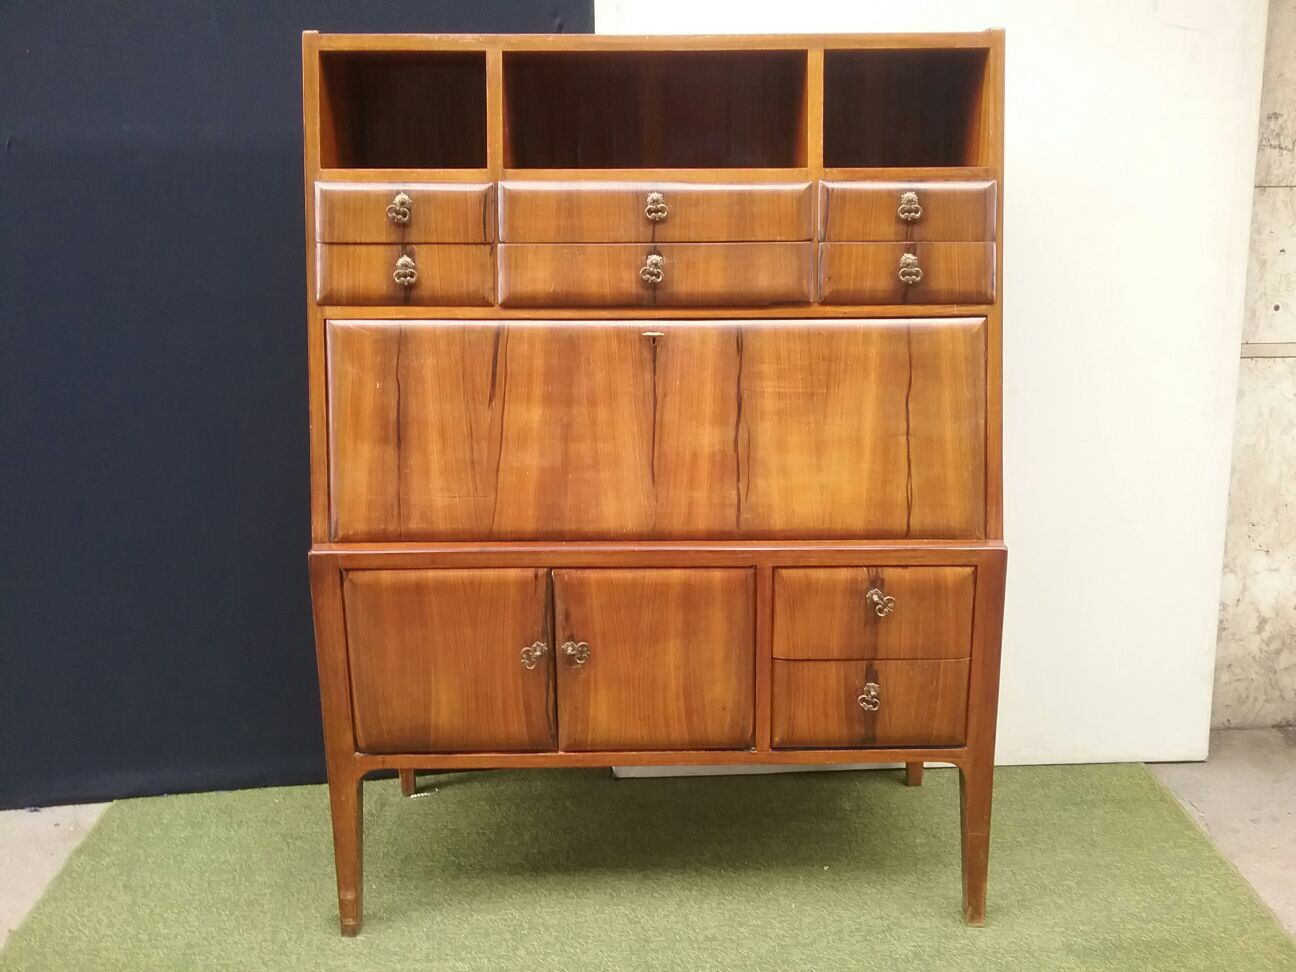 vintage barschrank 1950er bei pamono kaufen. Black Bedroom Furniture Sets. Home Design Ideas